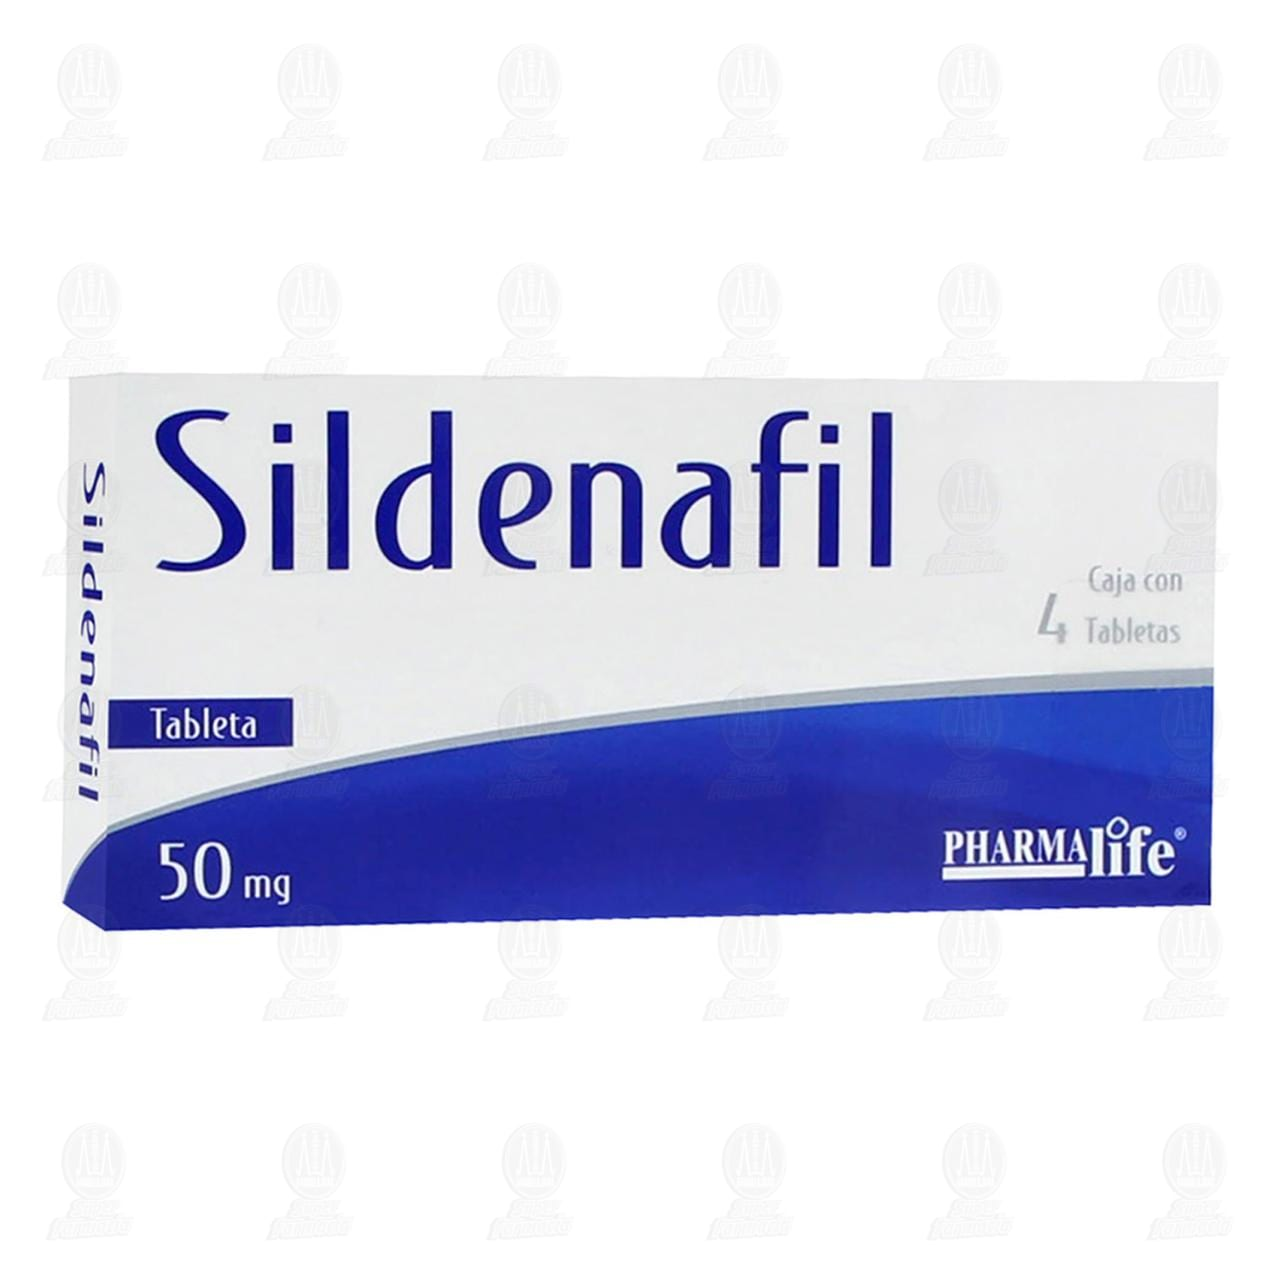 Sildenafil 50mg 4 Tabletas Pharmalife